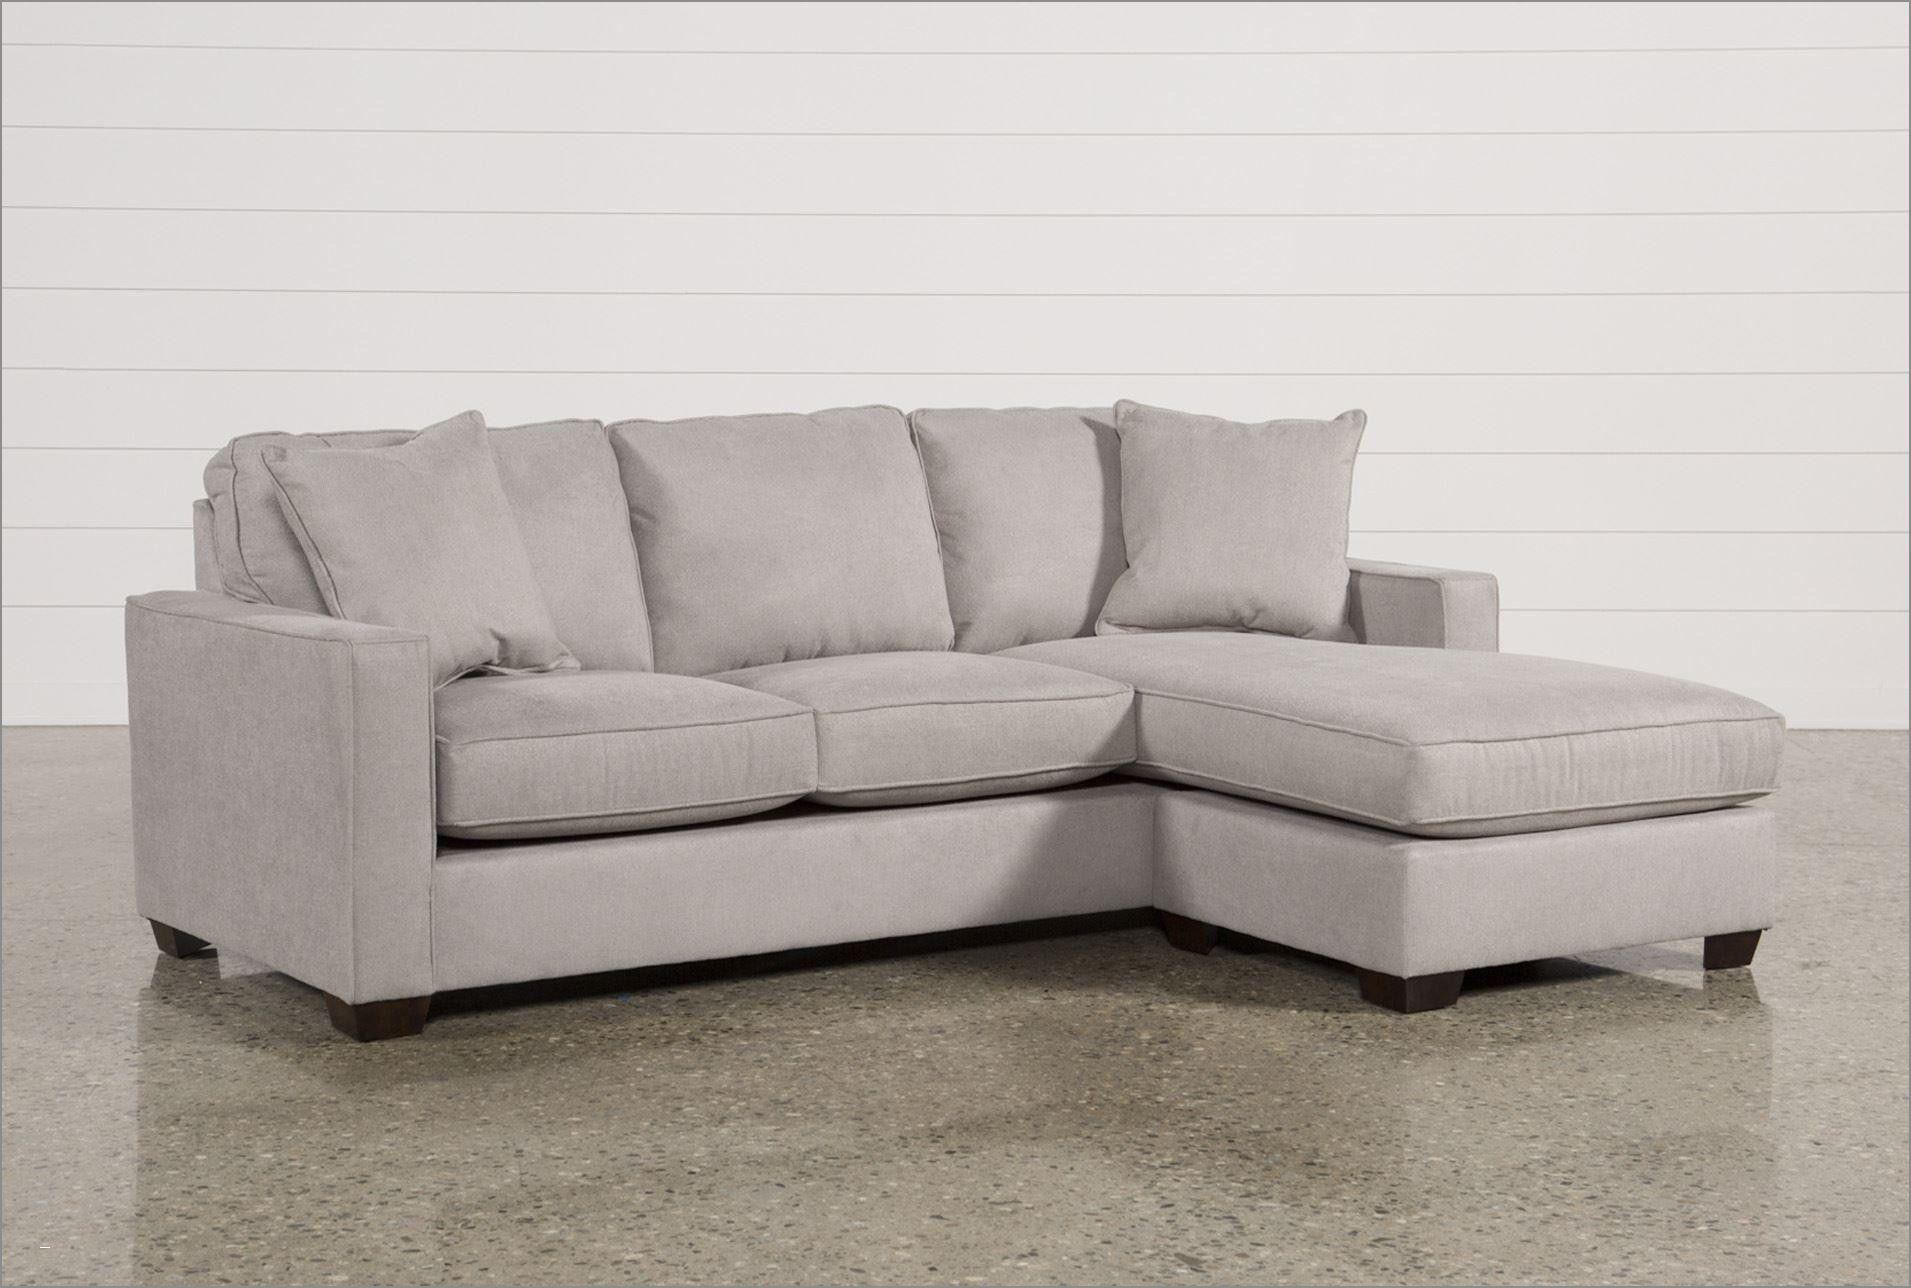 Sofa Bed Queen Mattress Leather corner sofa, Most